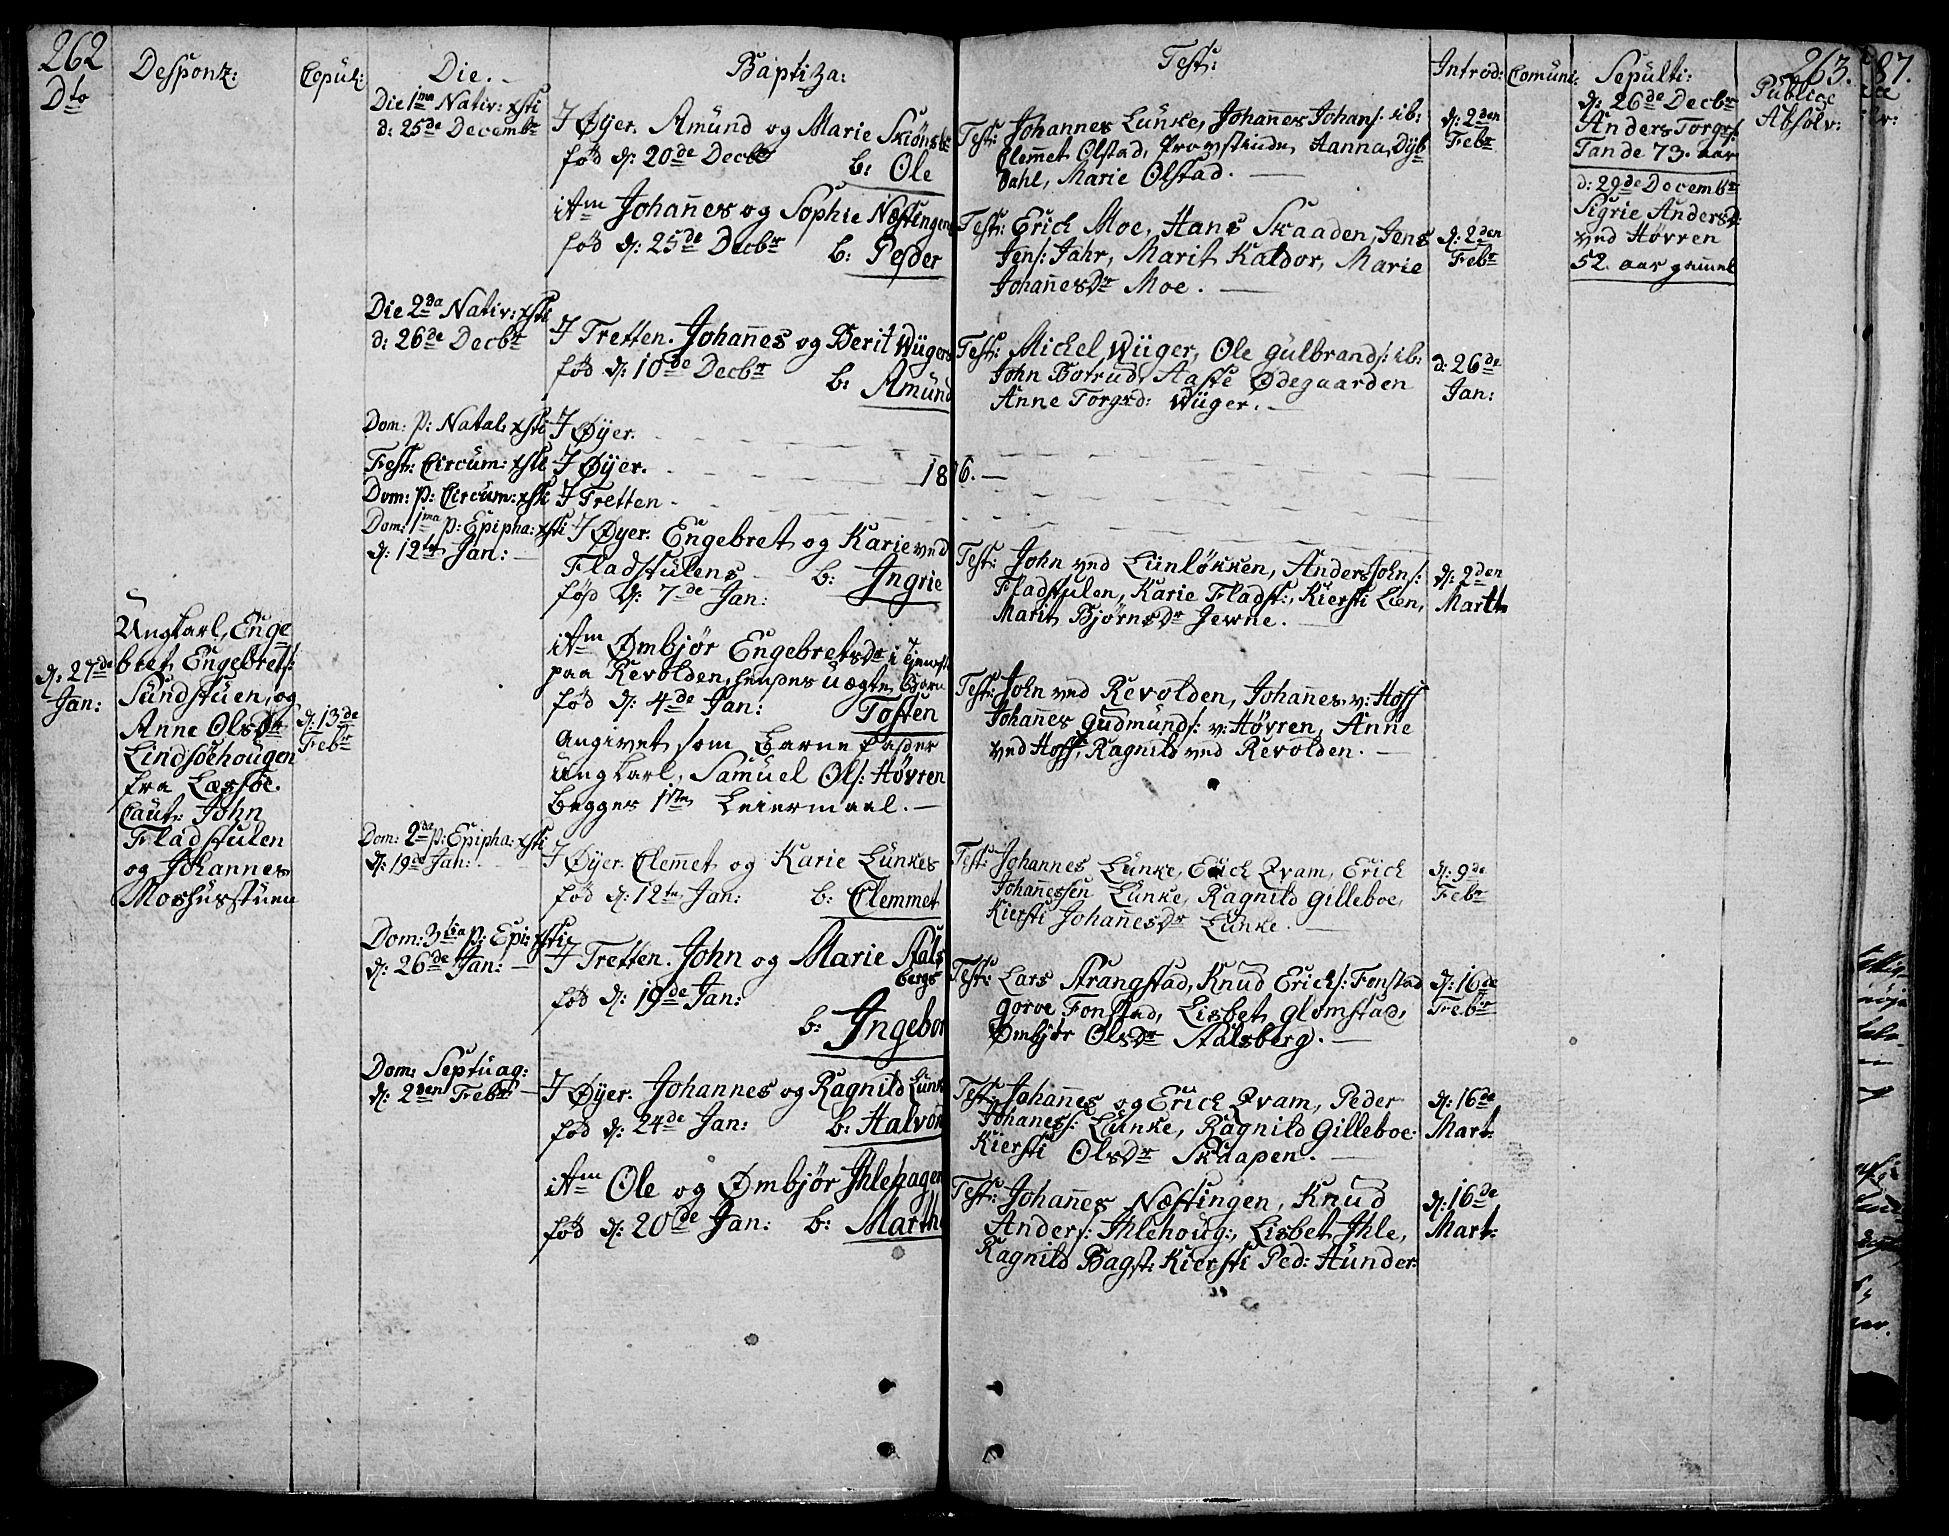 SAH, Øyer prestekontor, Ministerialbok nr. 3, 1784-1824, s. 262-263